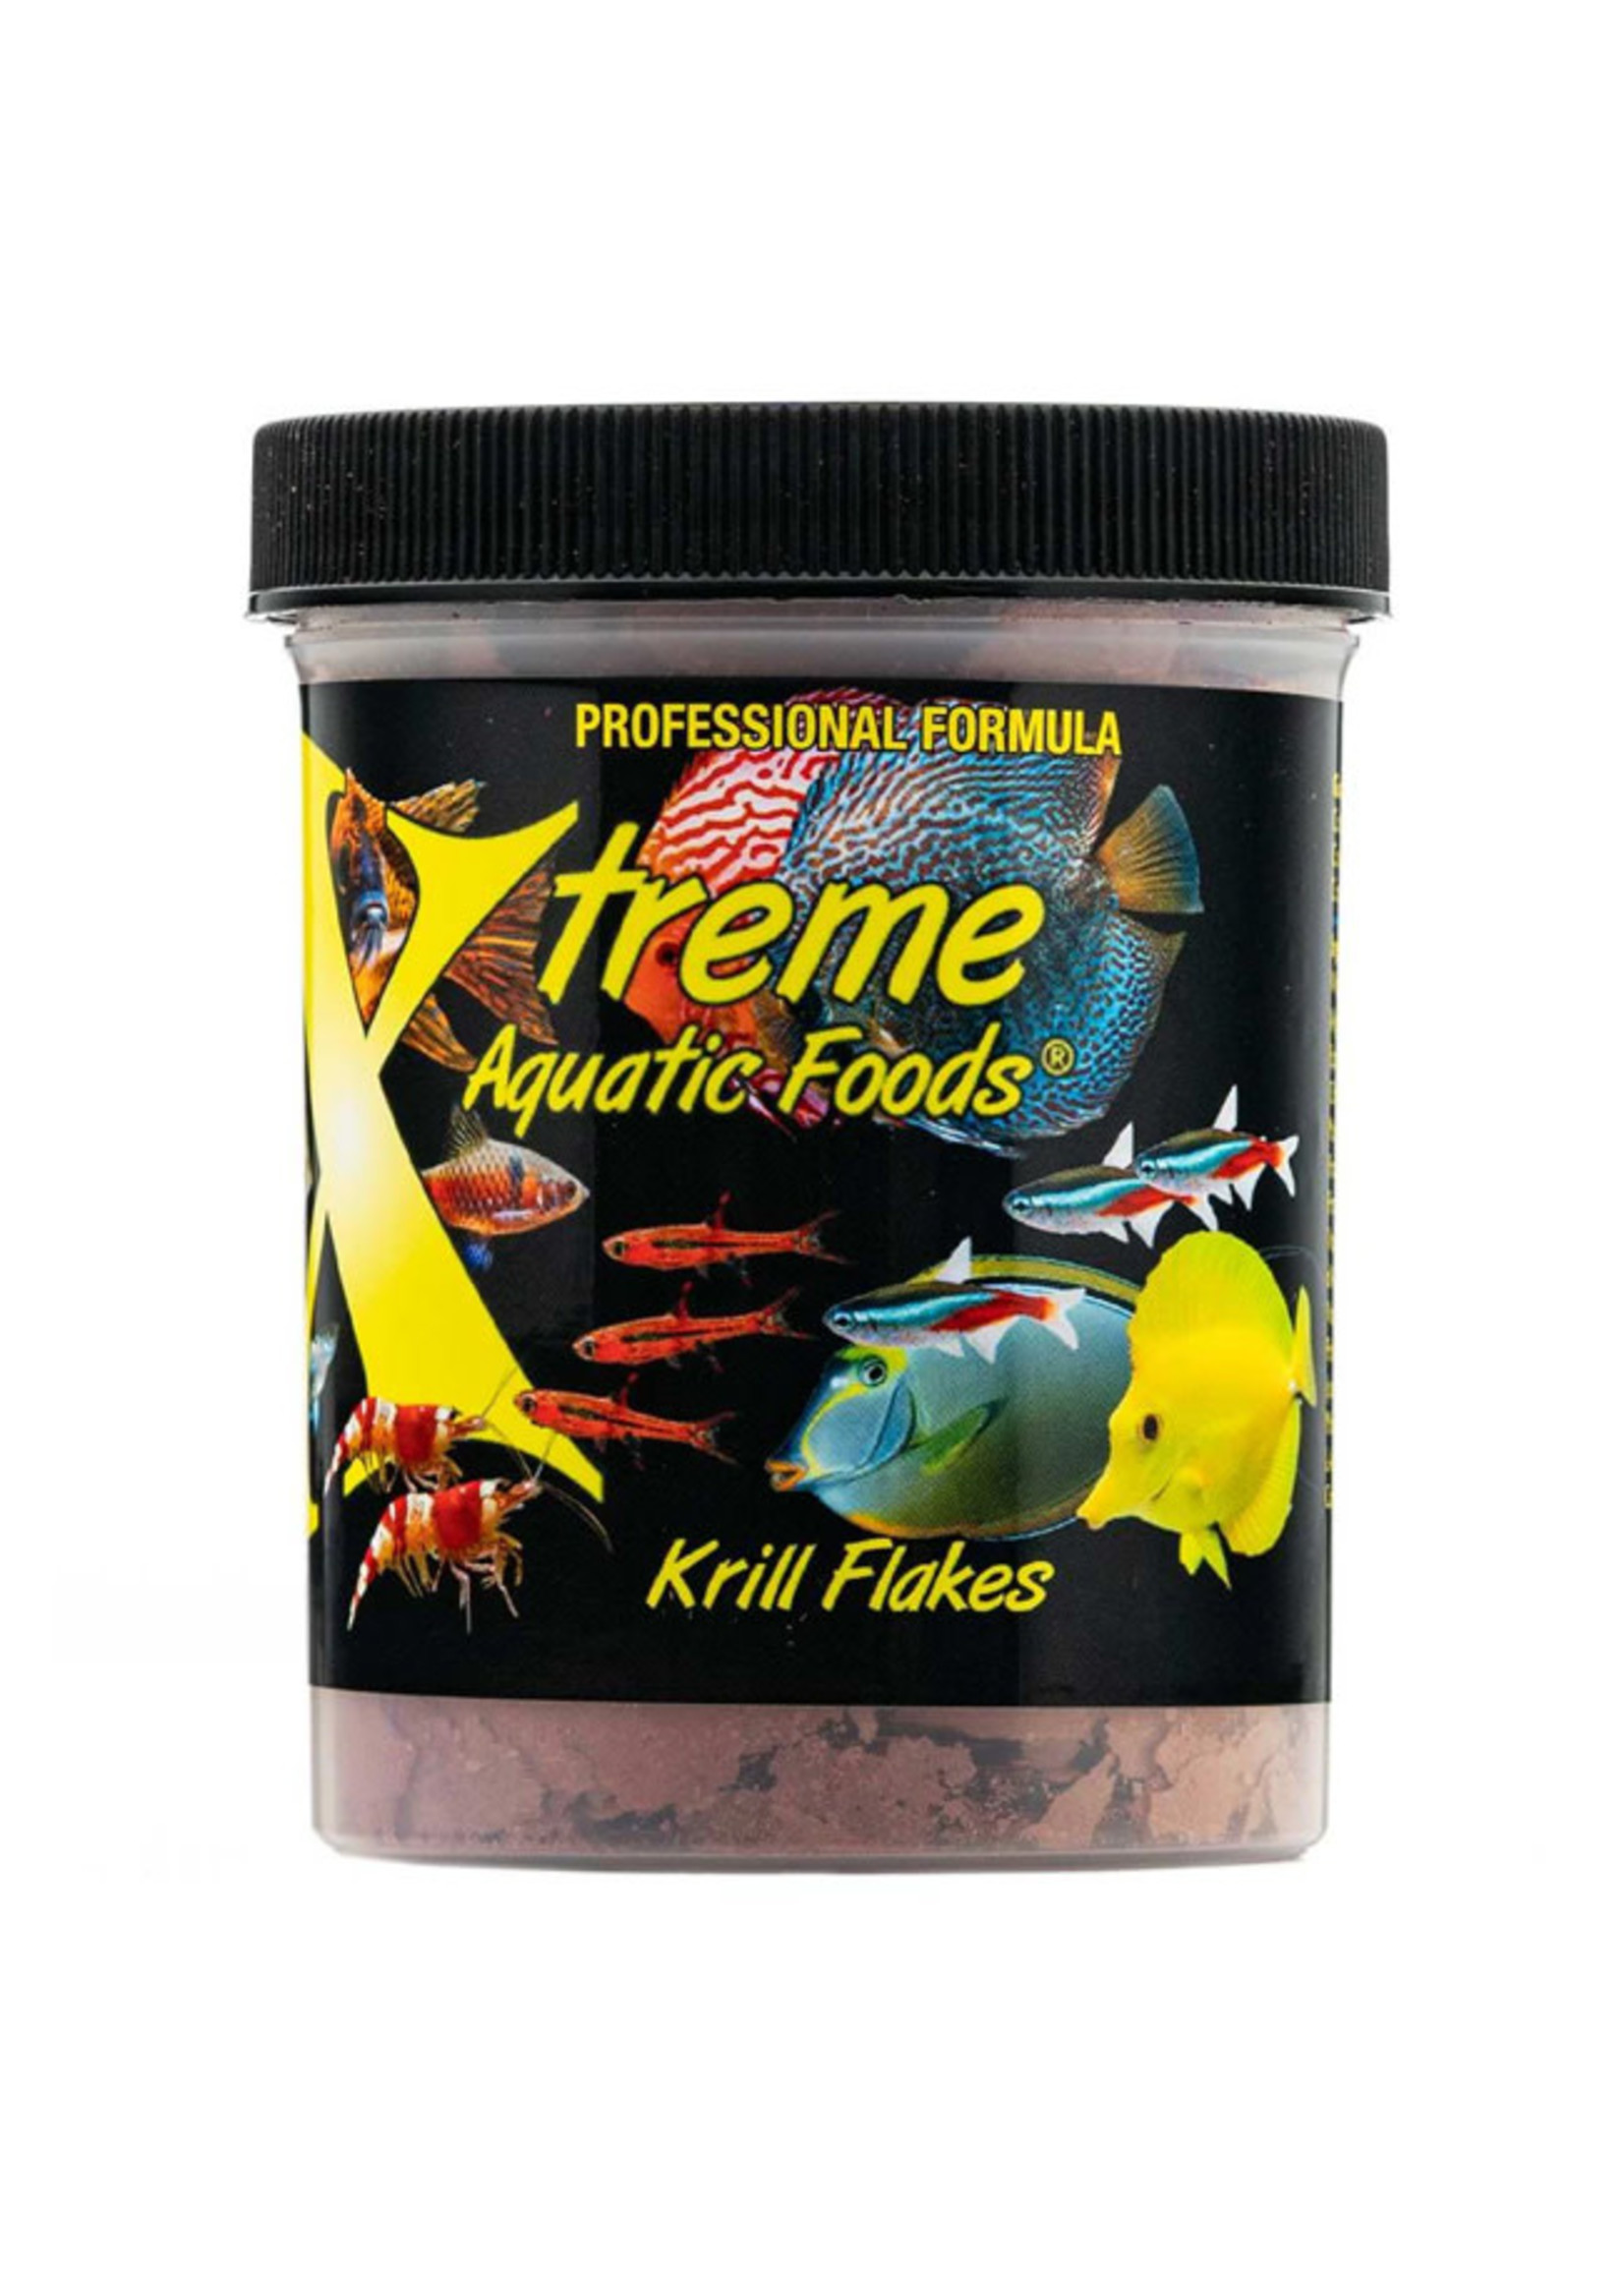 Xtreme Aquatic Foods Xtreme Marine Krill Flakes